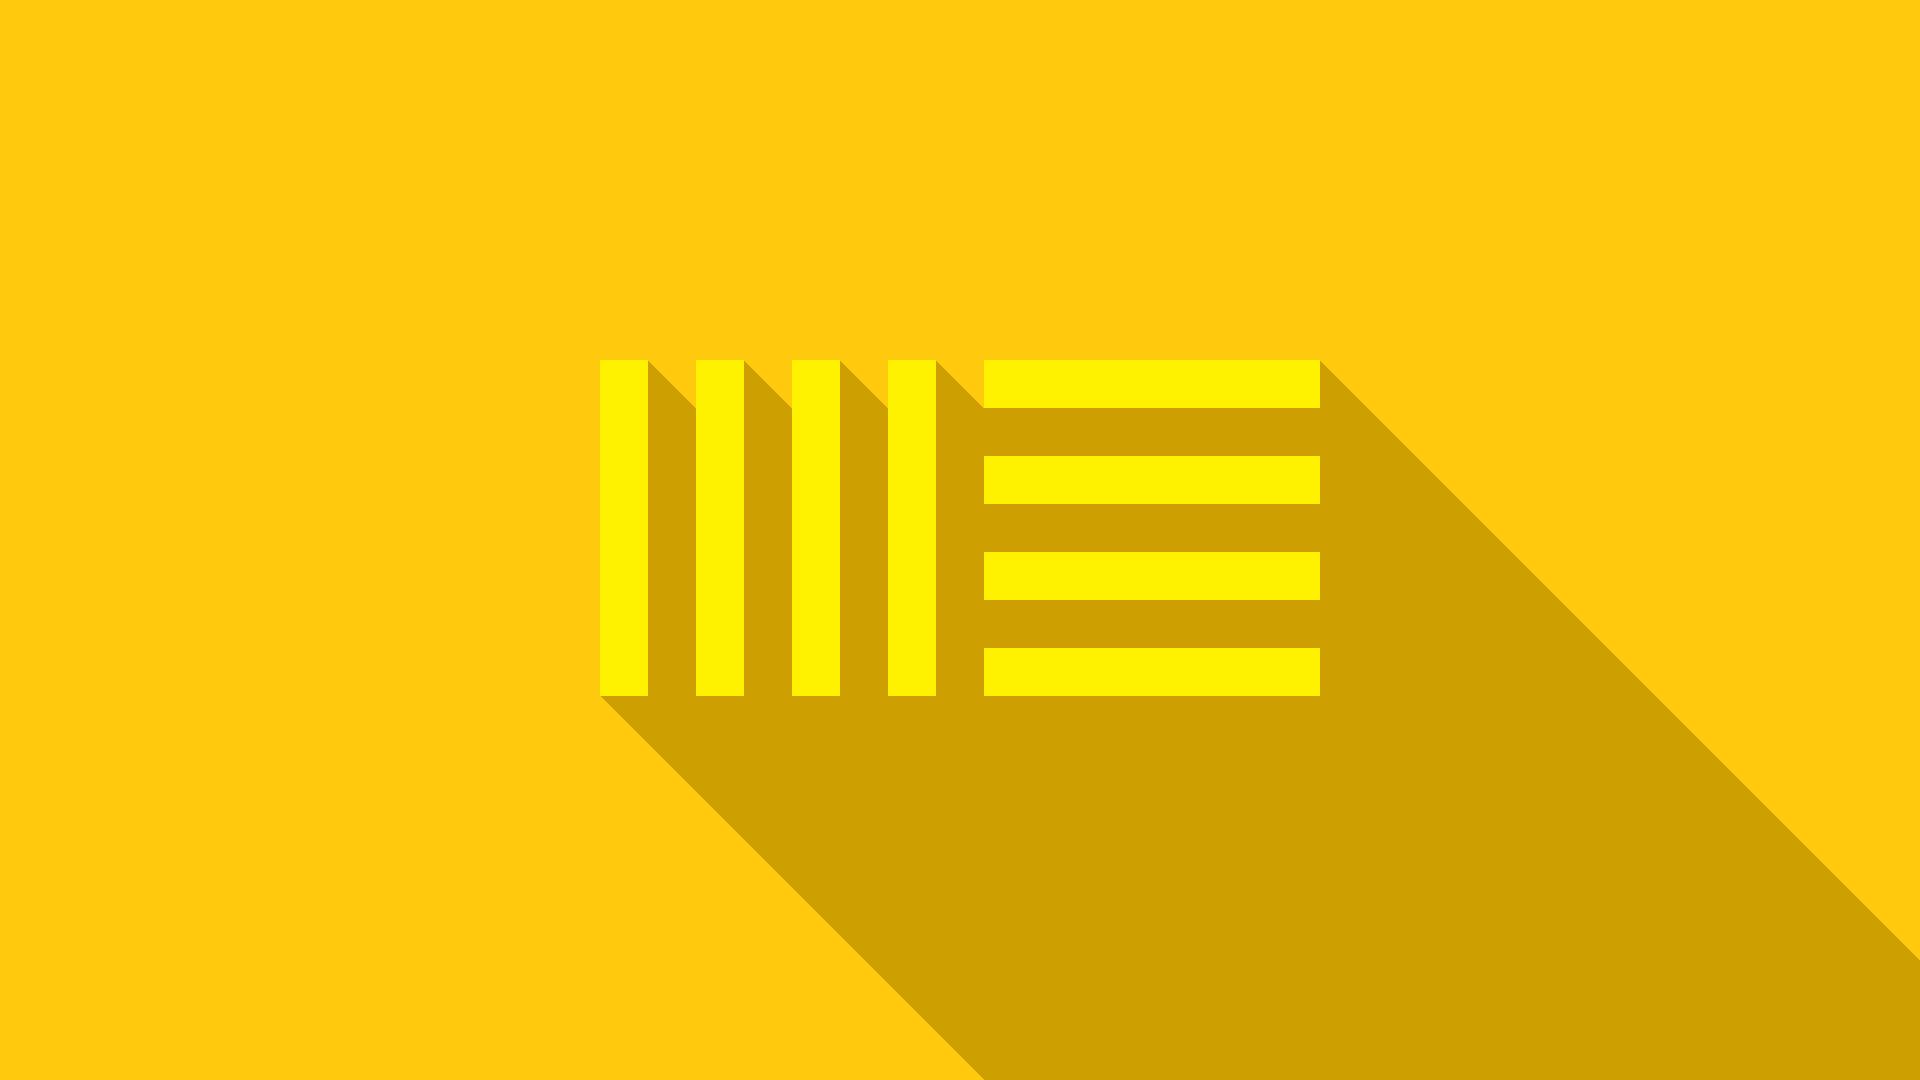 Minimal Ableton Live Wallpaper by dsrange431 1920x1080